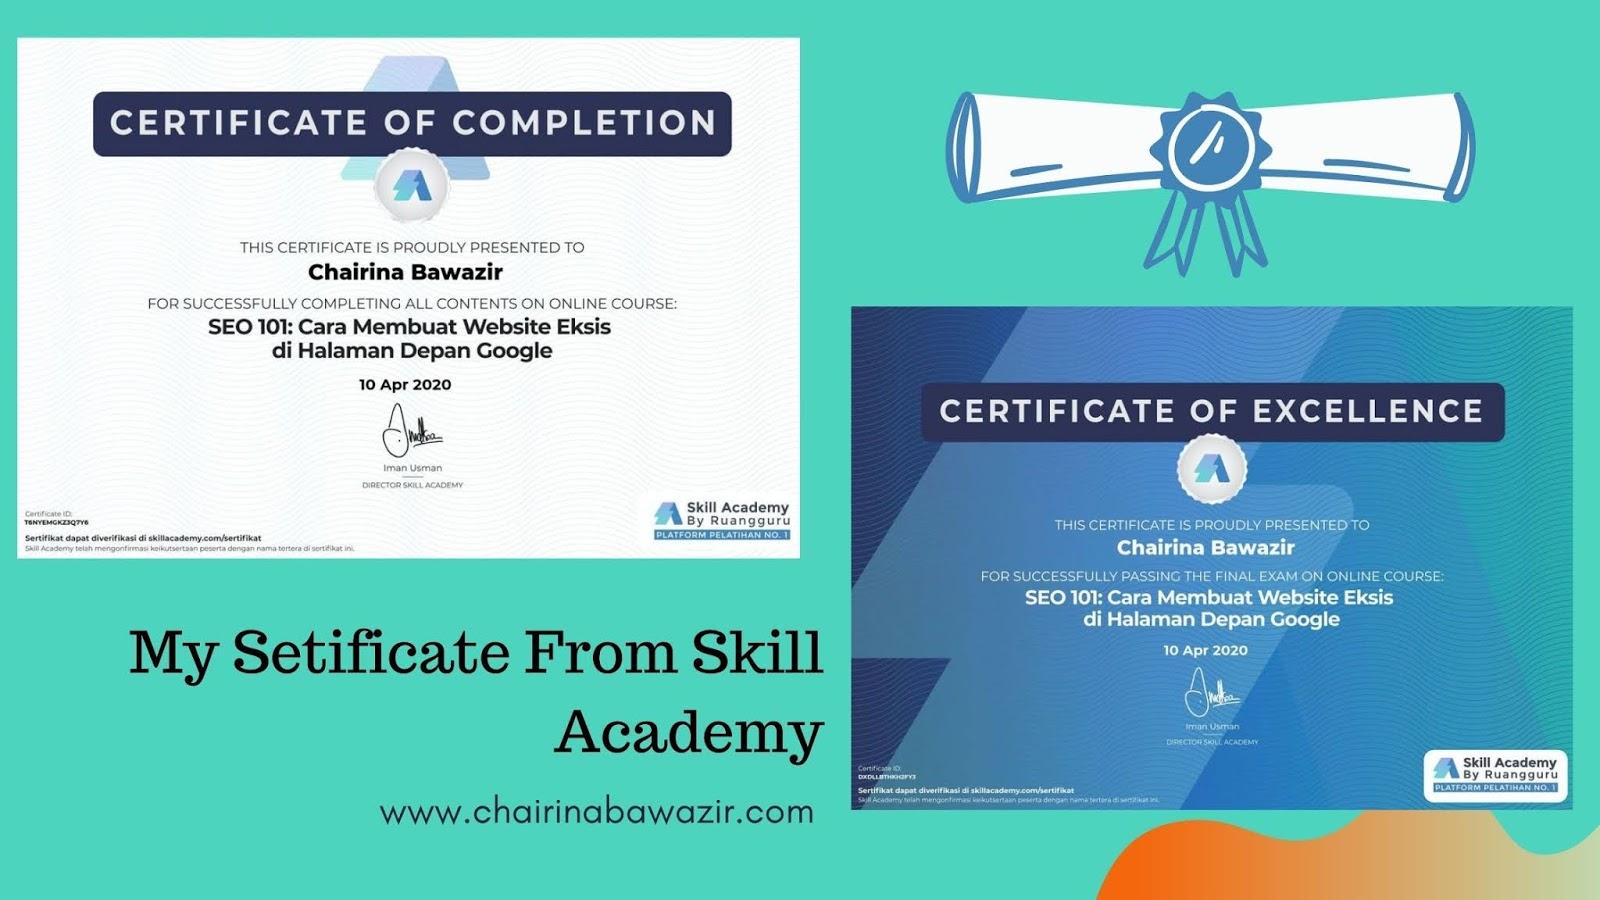 sertifikat-Skill-academy-by-ruangguru